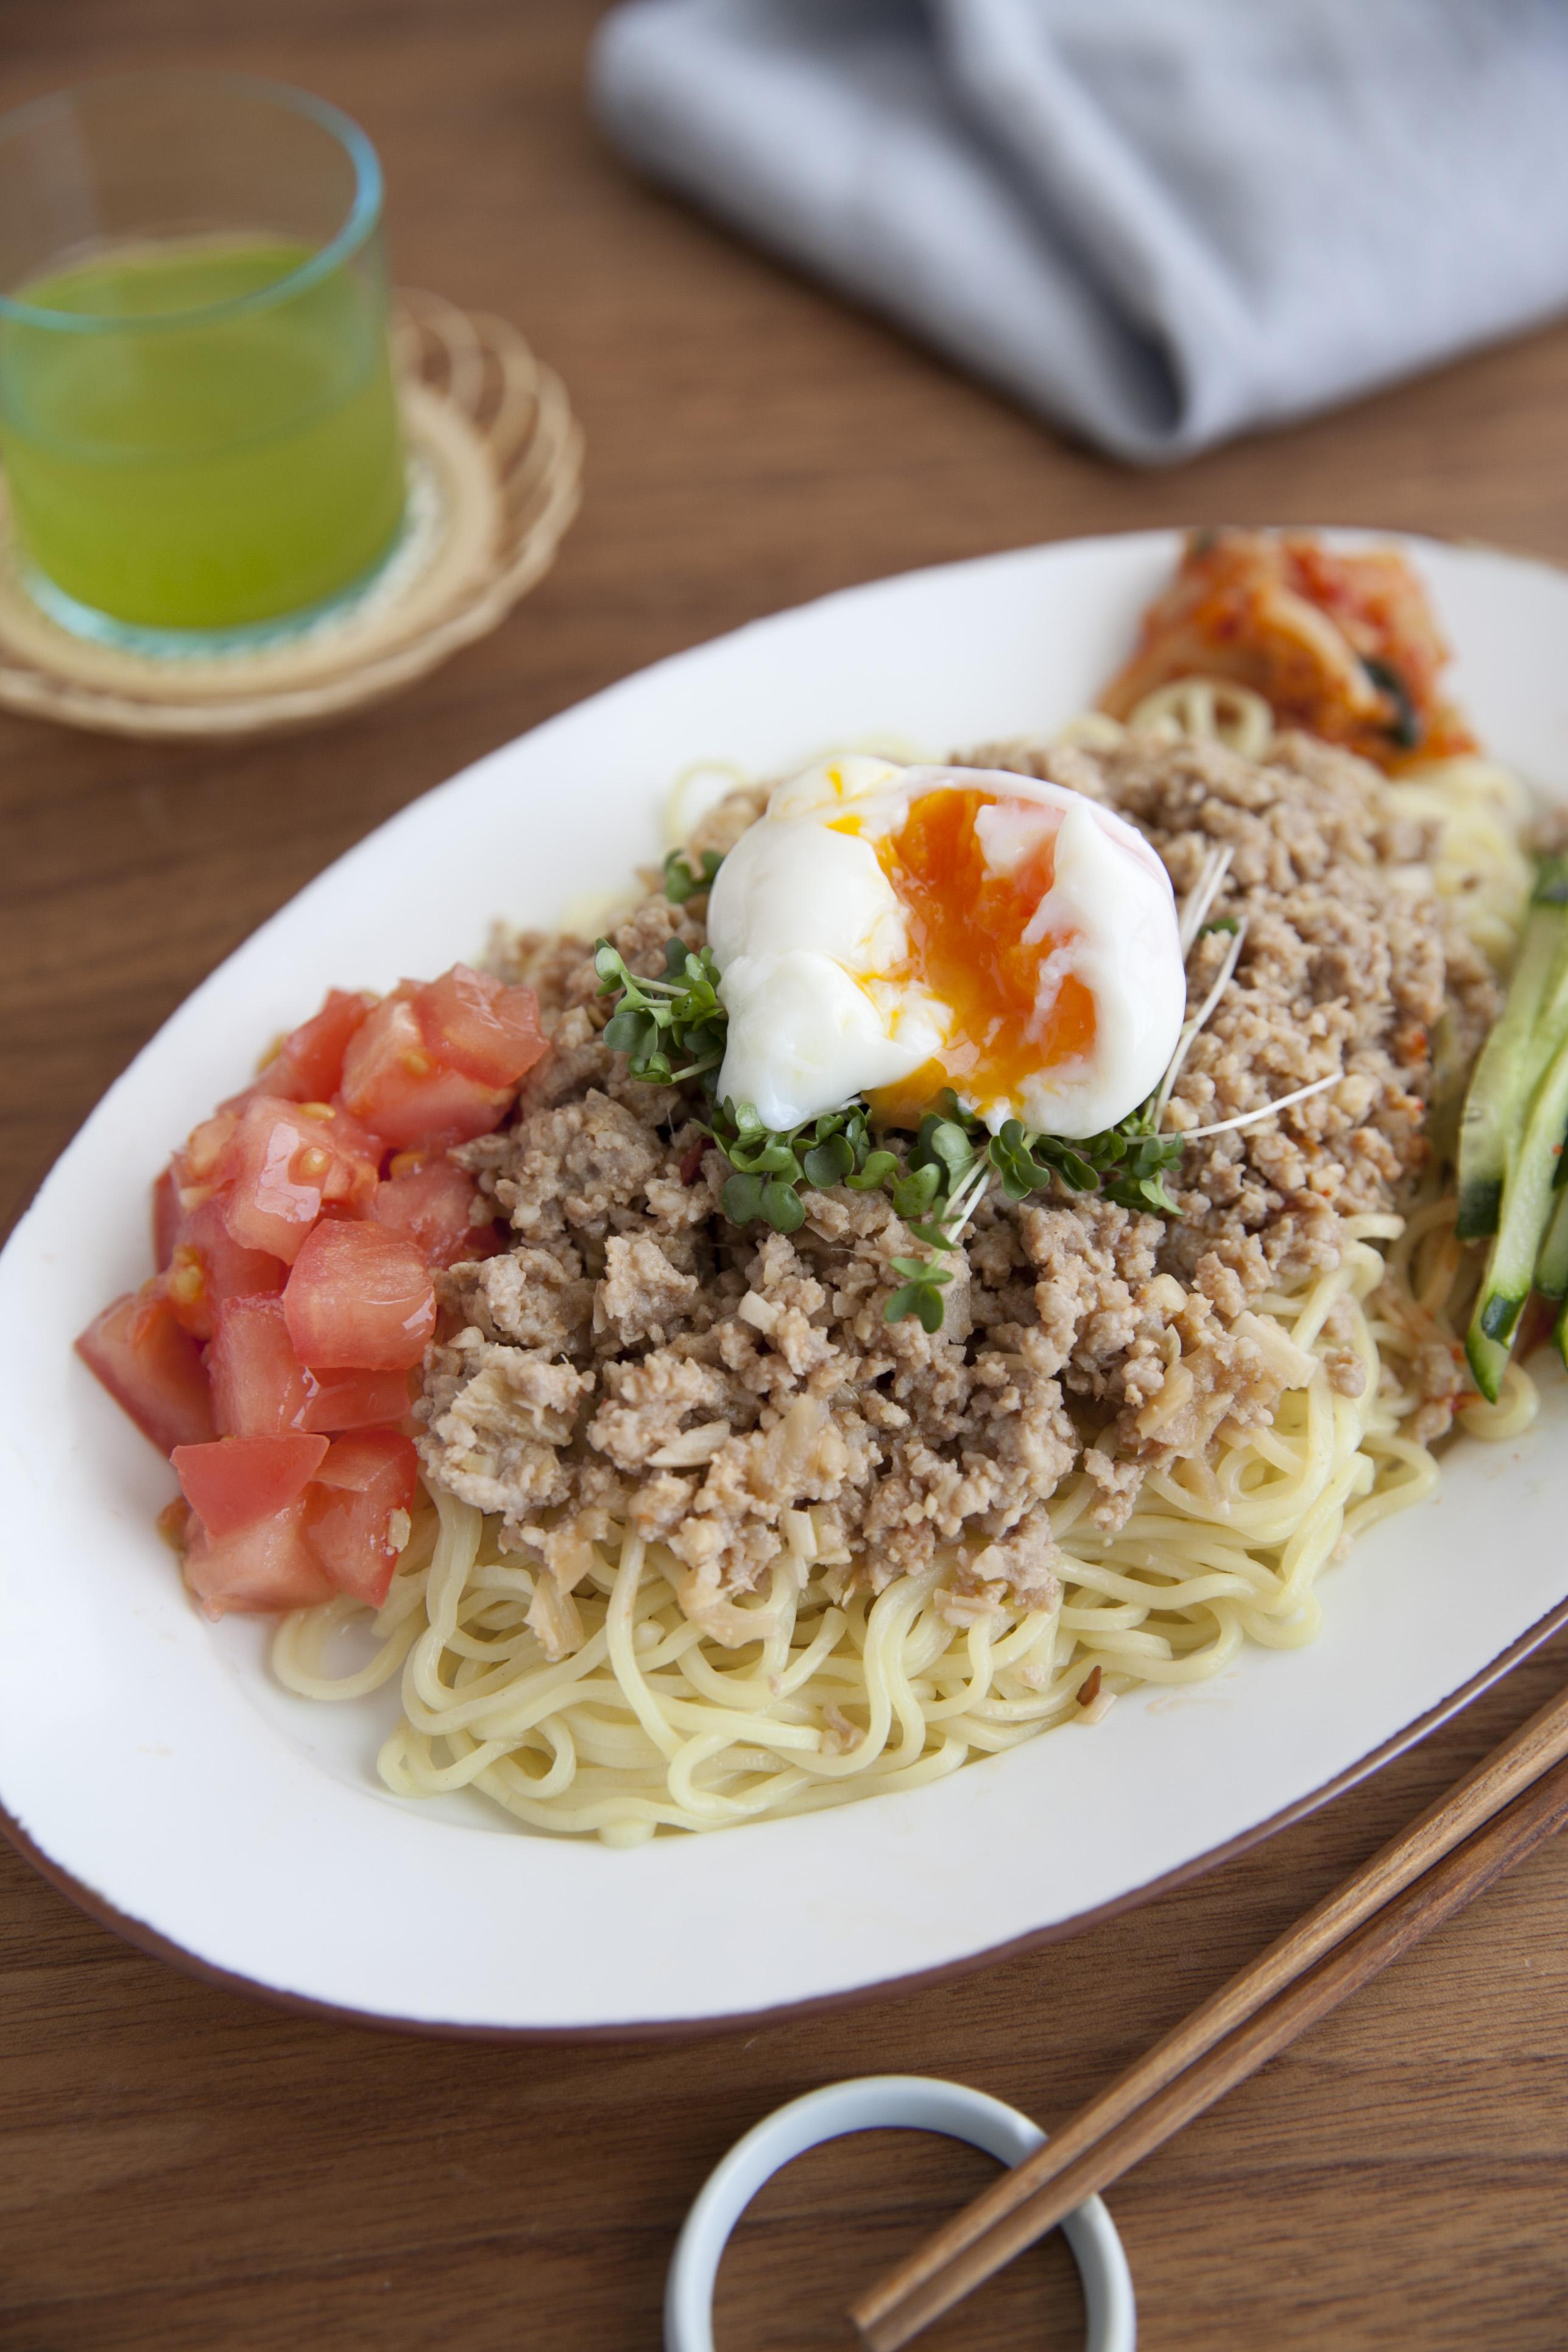 Nadia記事公開!「男子も大満足!お手軽だけど食べ応えのある「麺レシピ」」